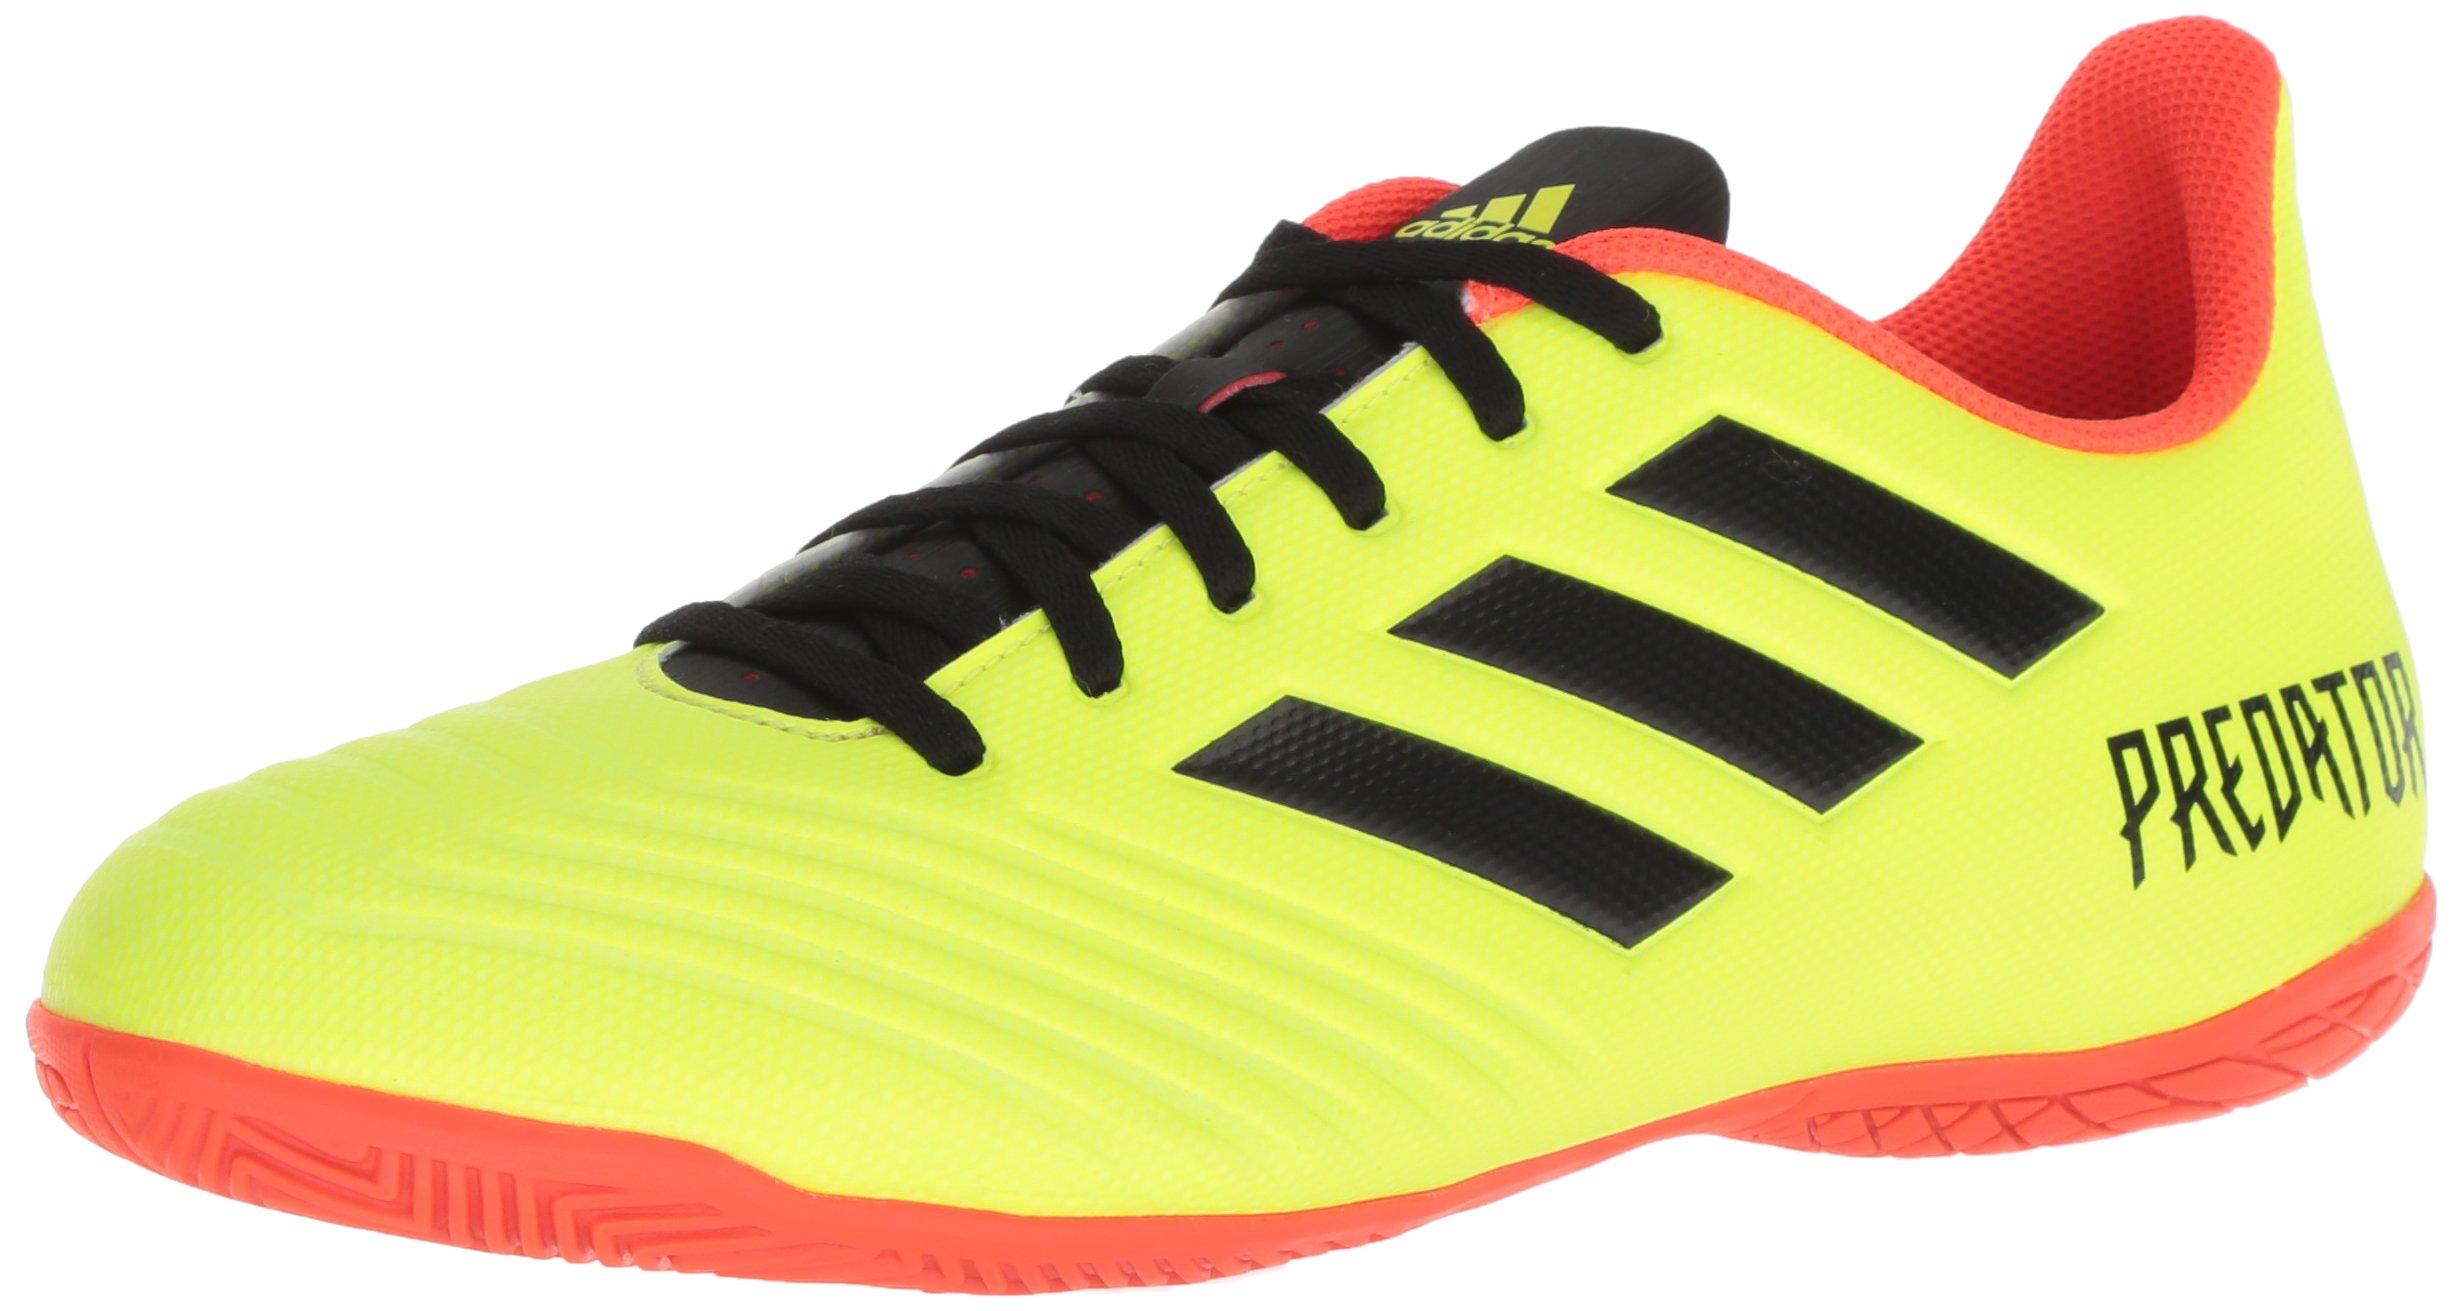 adidas Men's Predator Tango 18.4 Indoor Soccer Shoe, Solar Yellow/Black/Solar Red, 11 M US